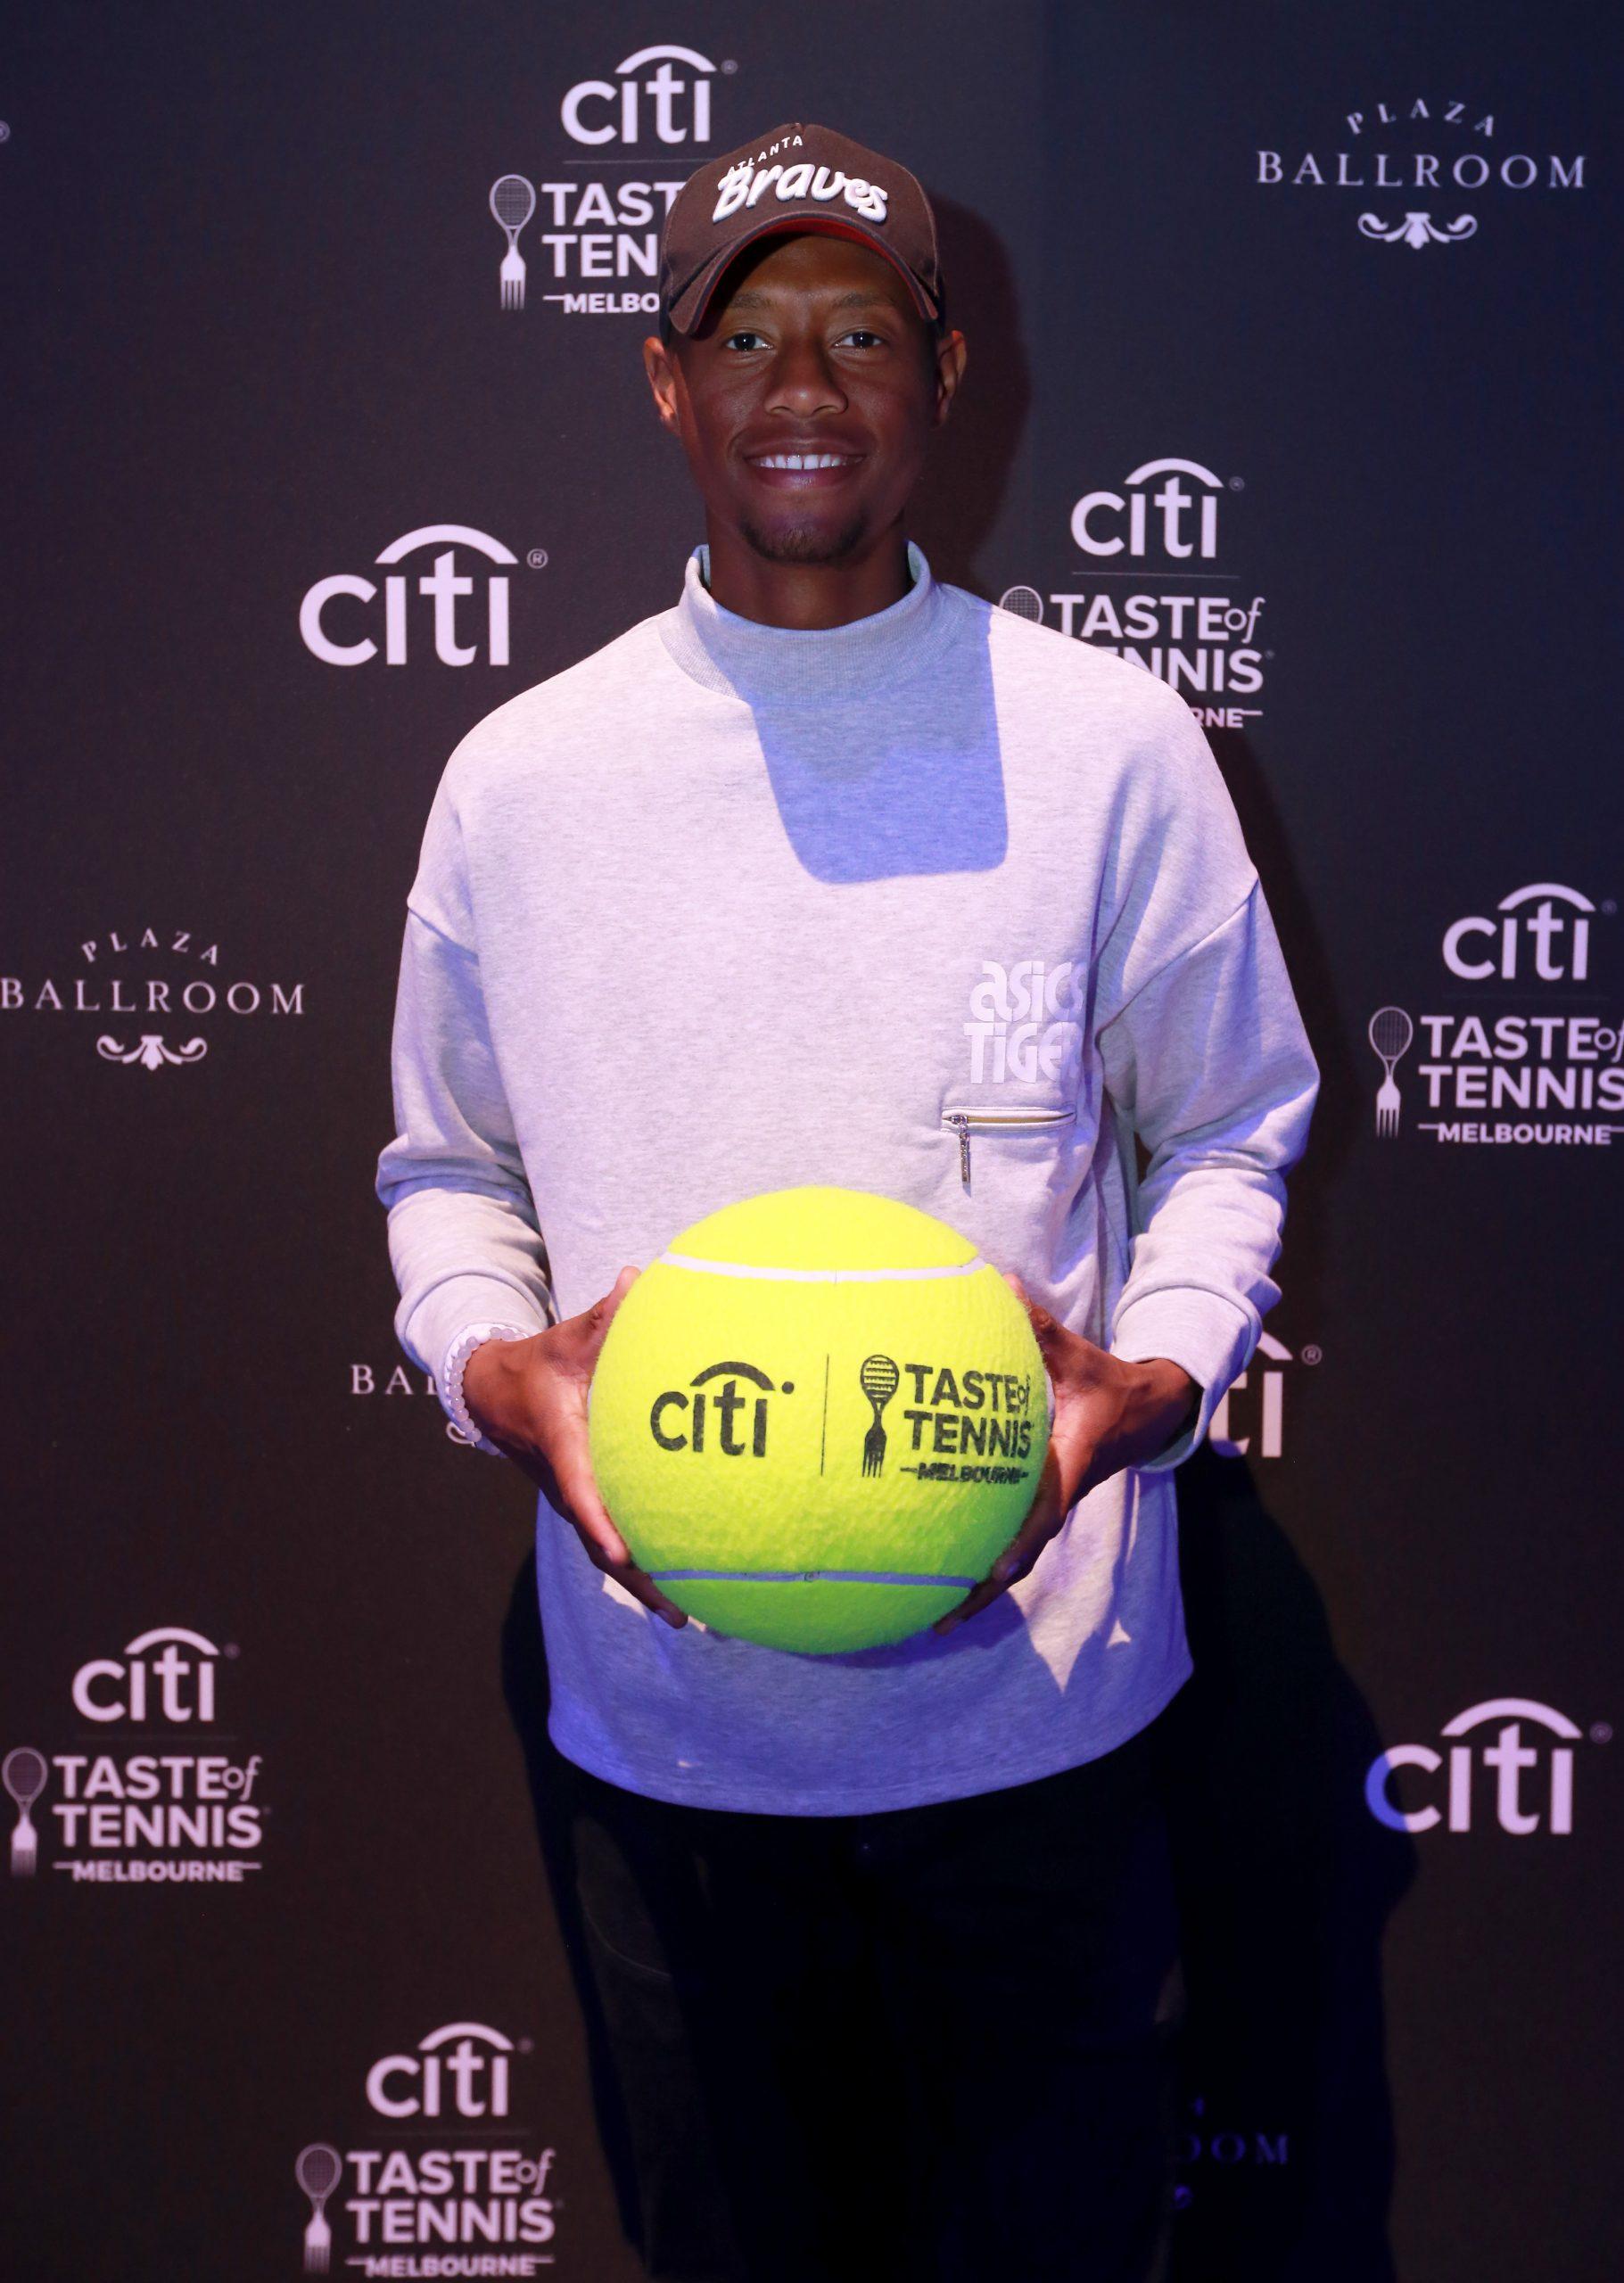 Dayana Yastremska Photos Photos - Citi Taste Of Tennis